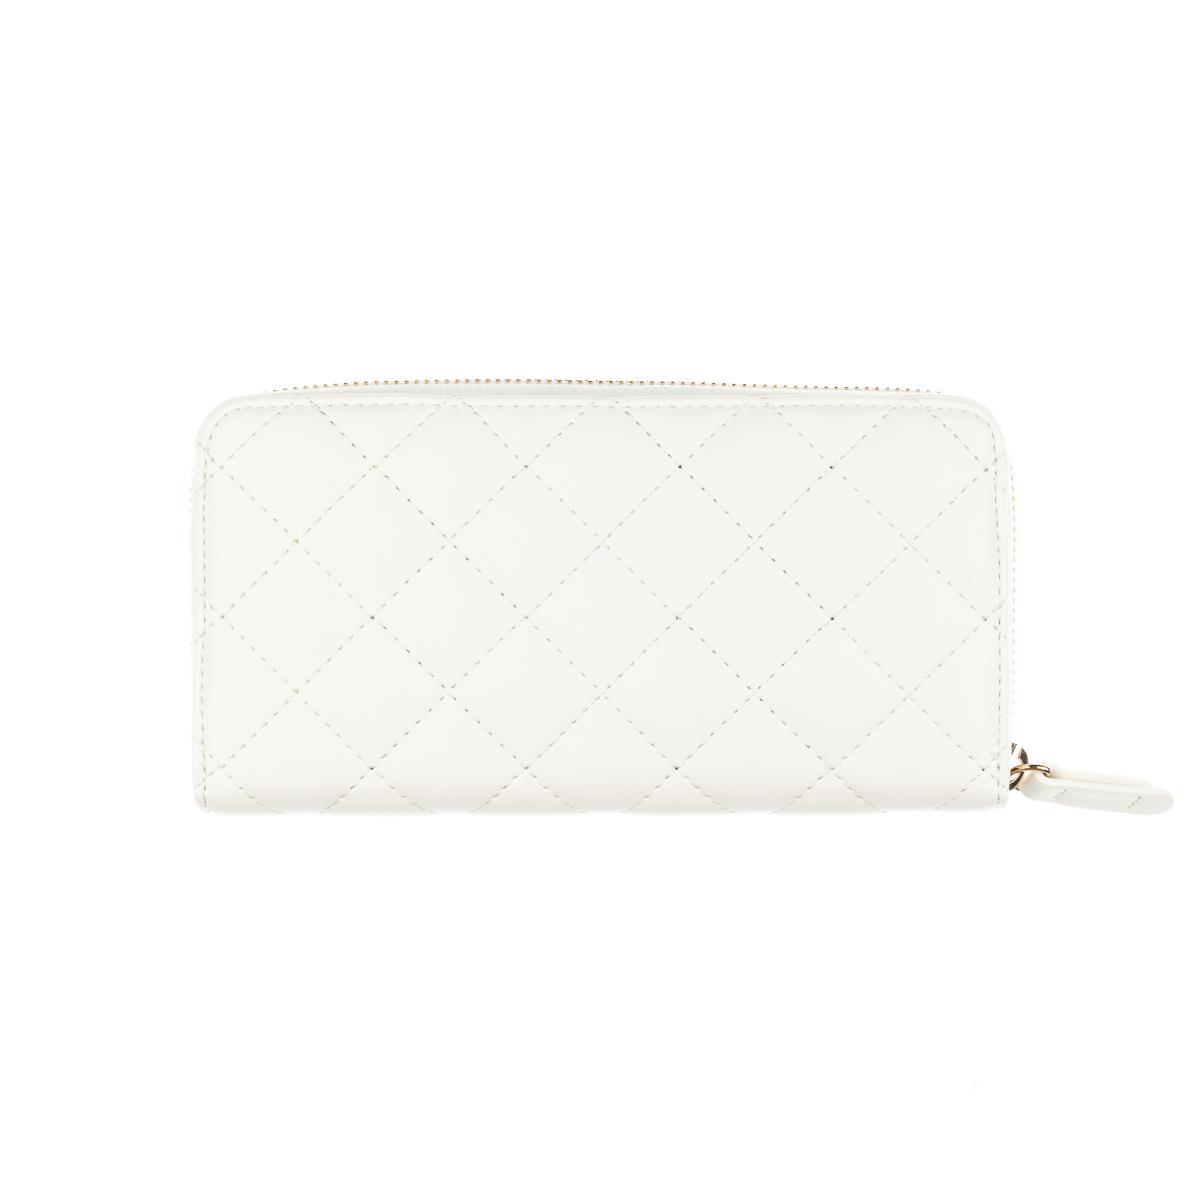 Portafoglio XL Zip Around matelassè bianco lana  LIU JO